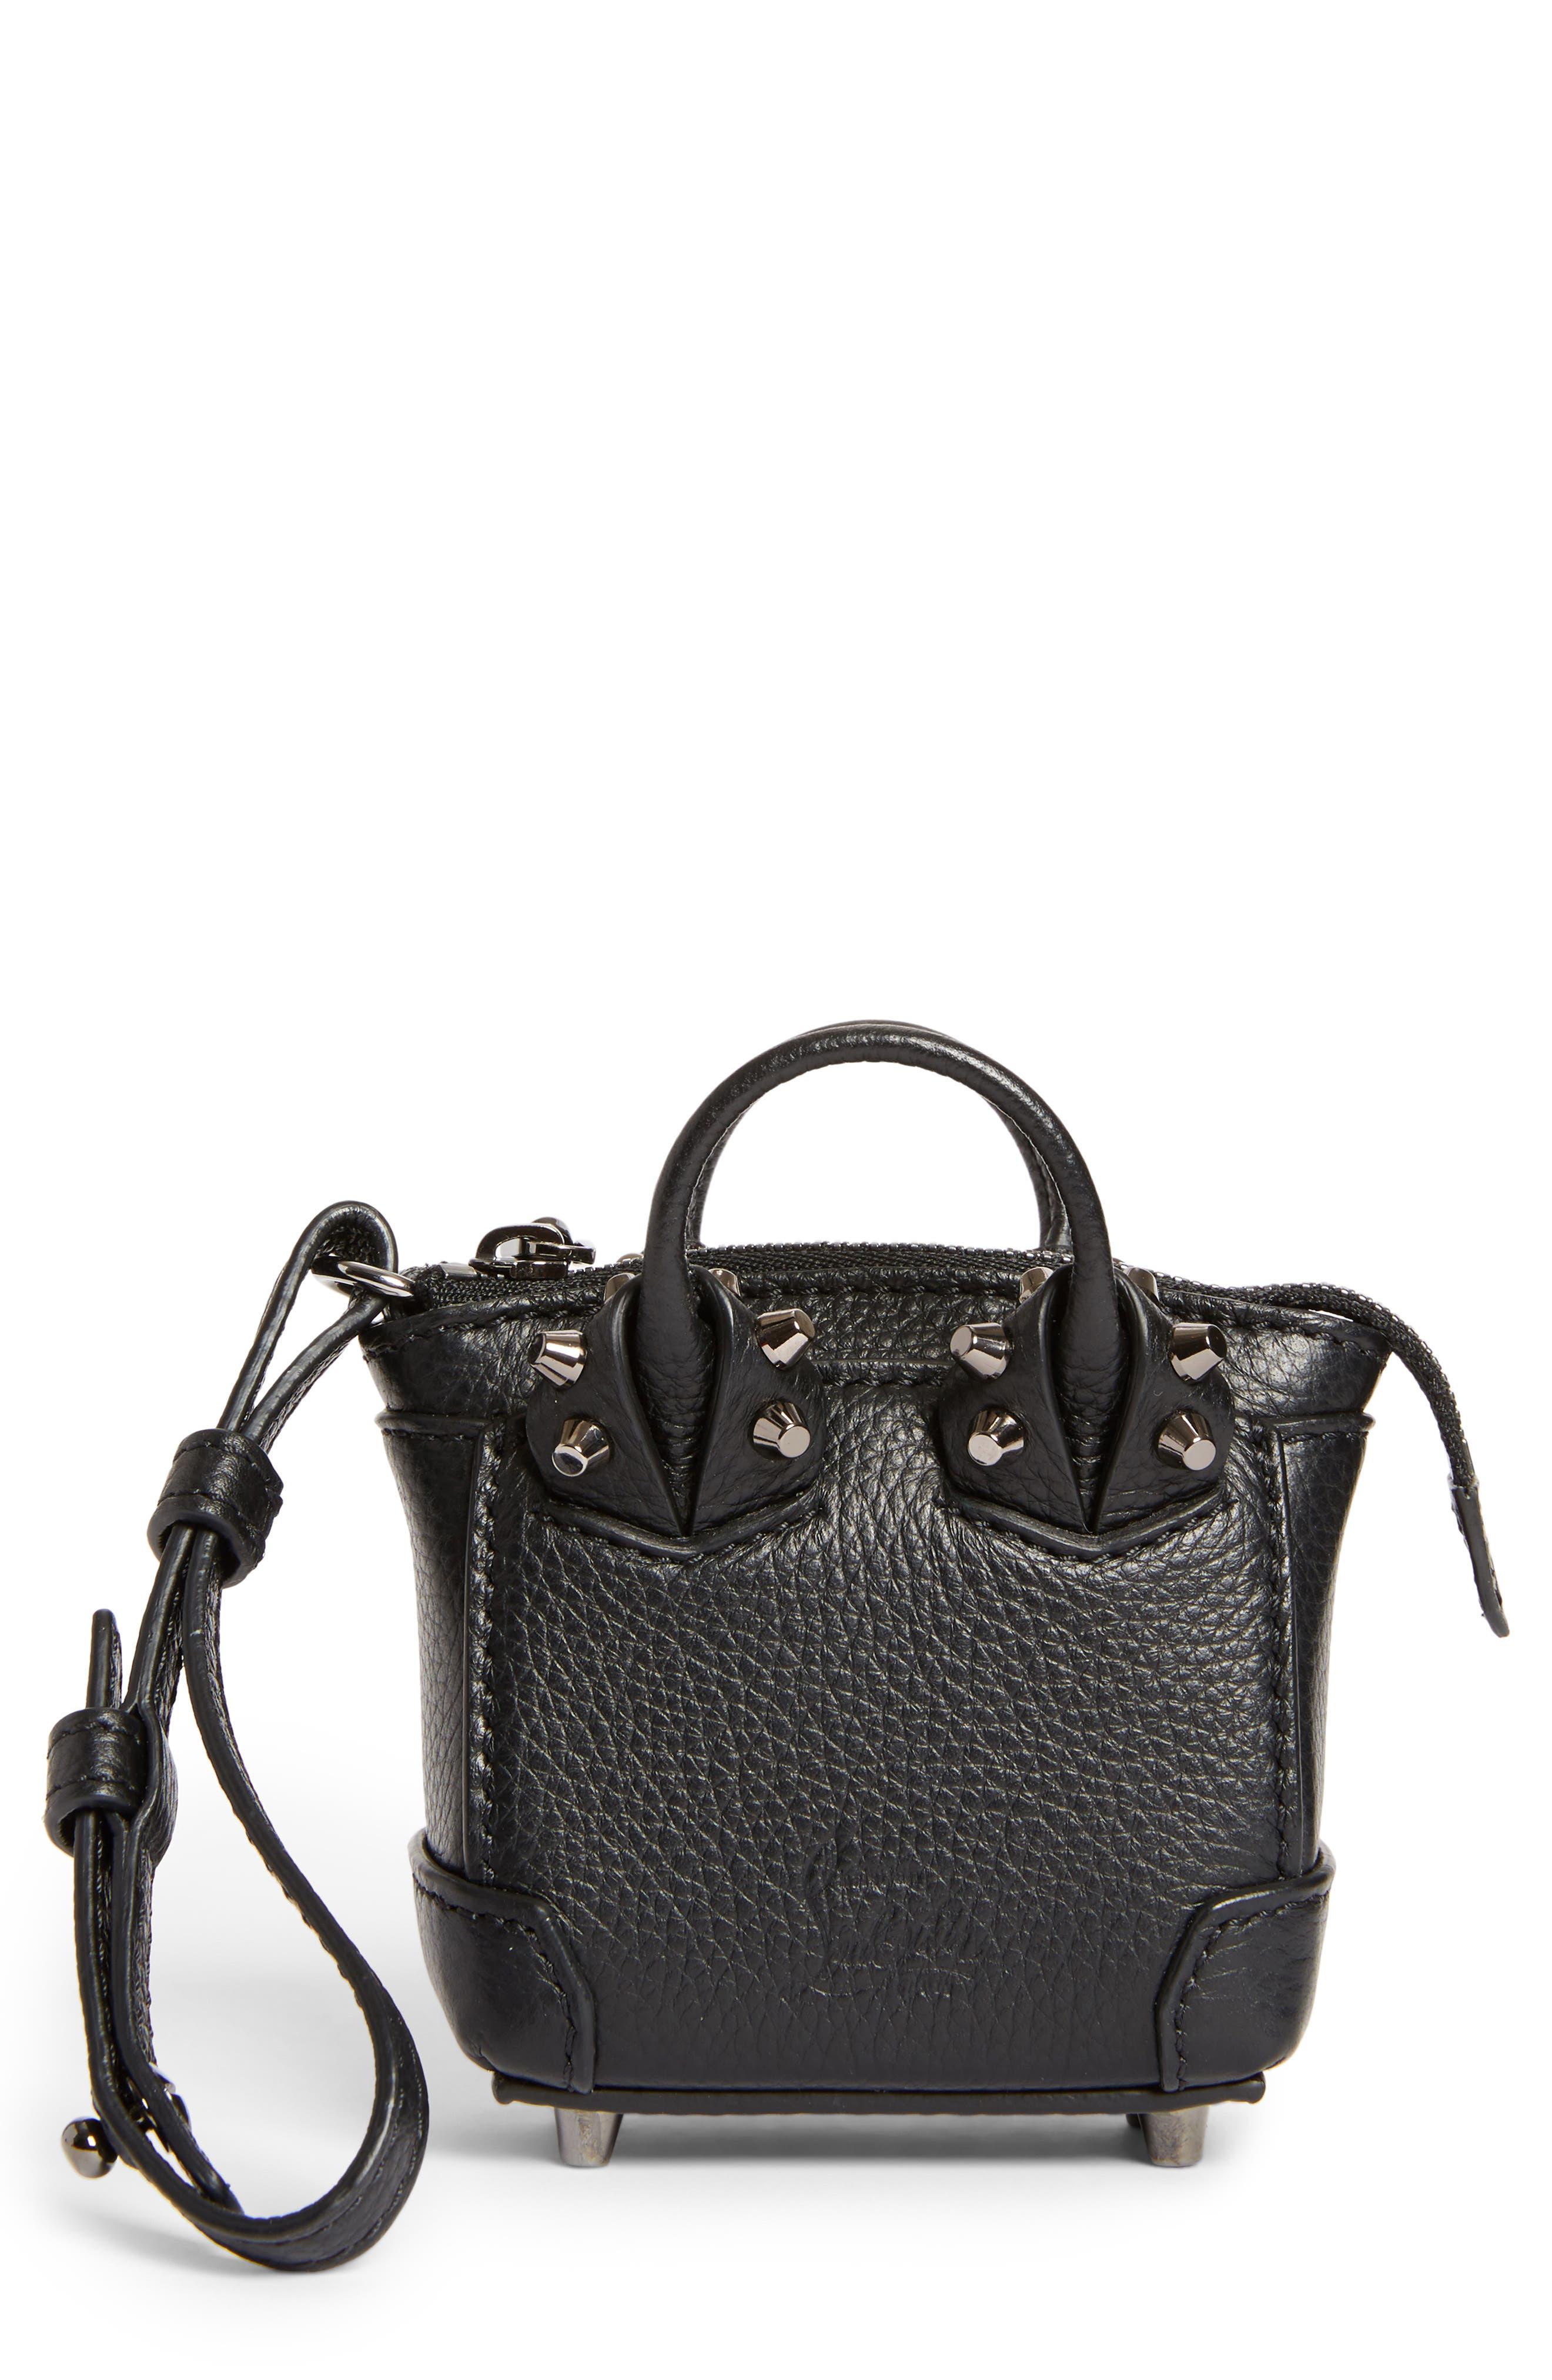 Eloise Mini Leather Bag Charm,                         Main,                         color, BLACK/ GUN METAL